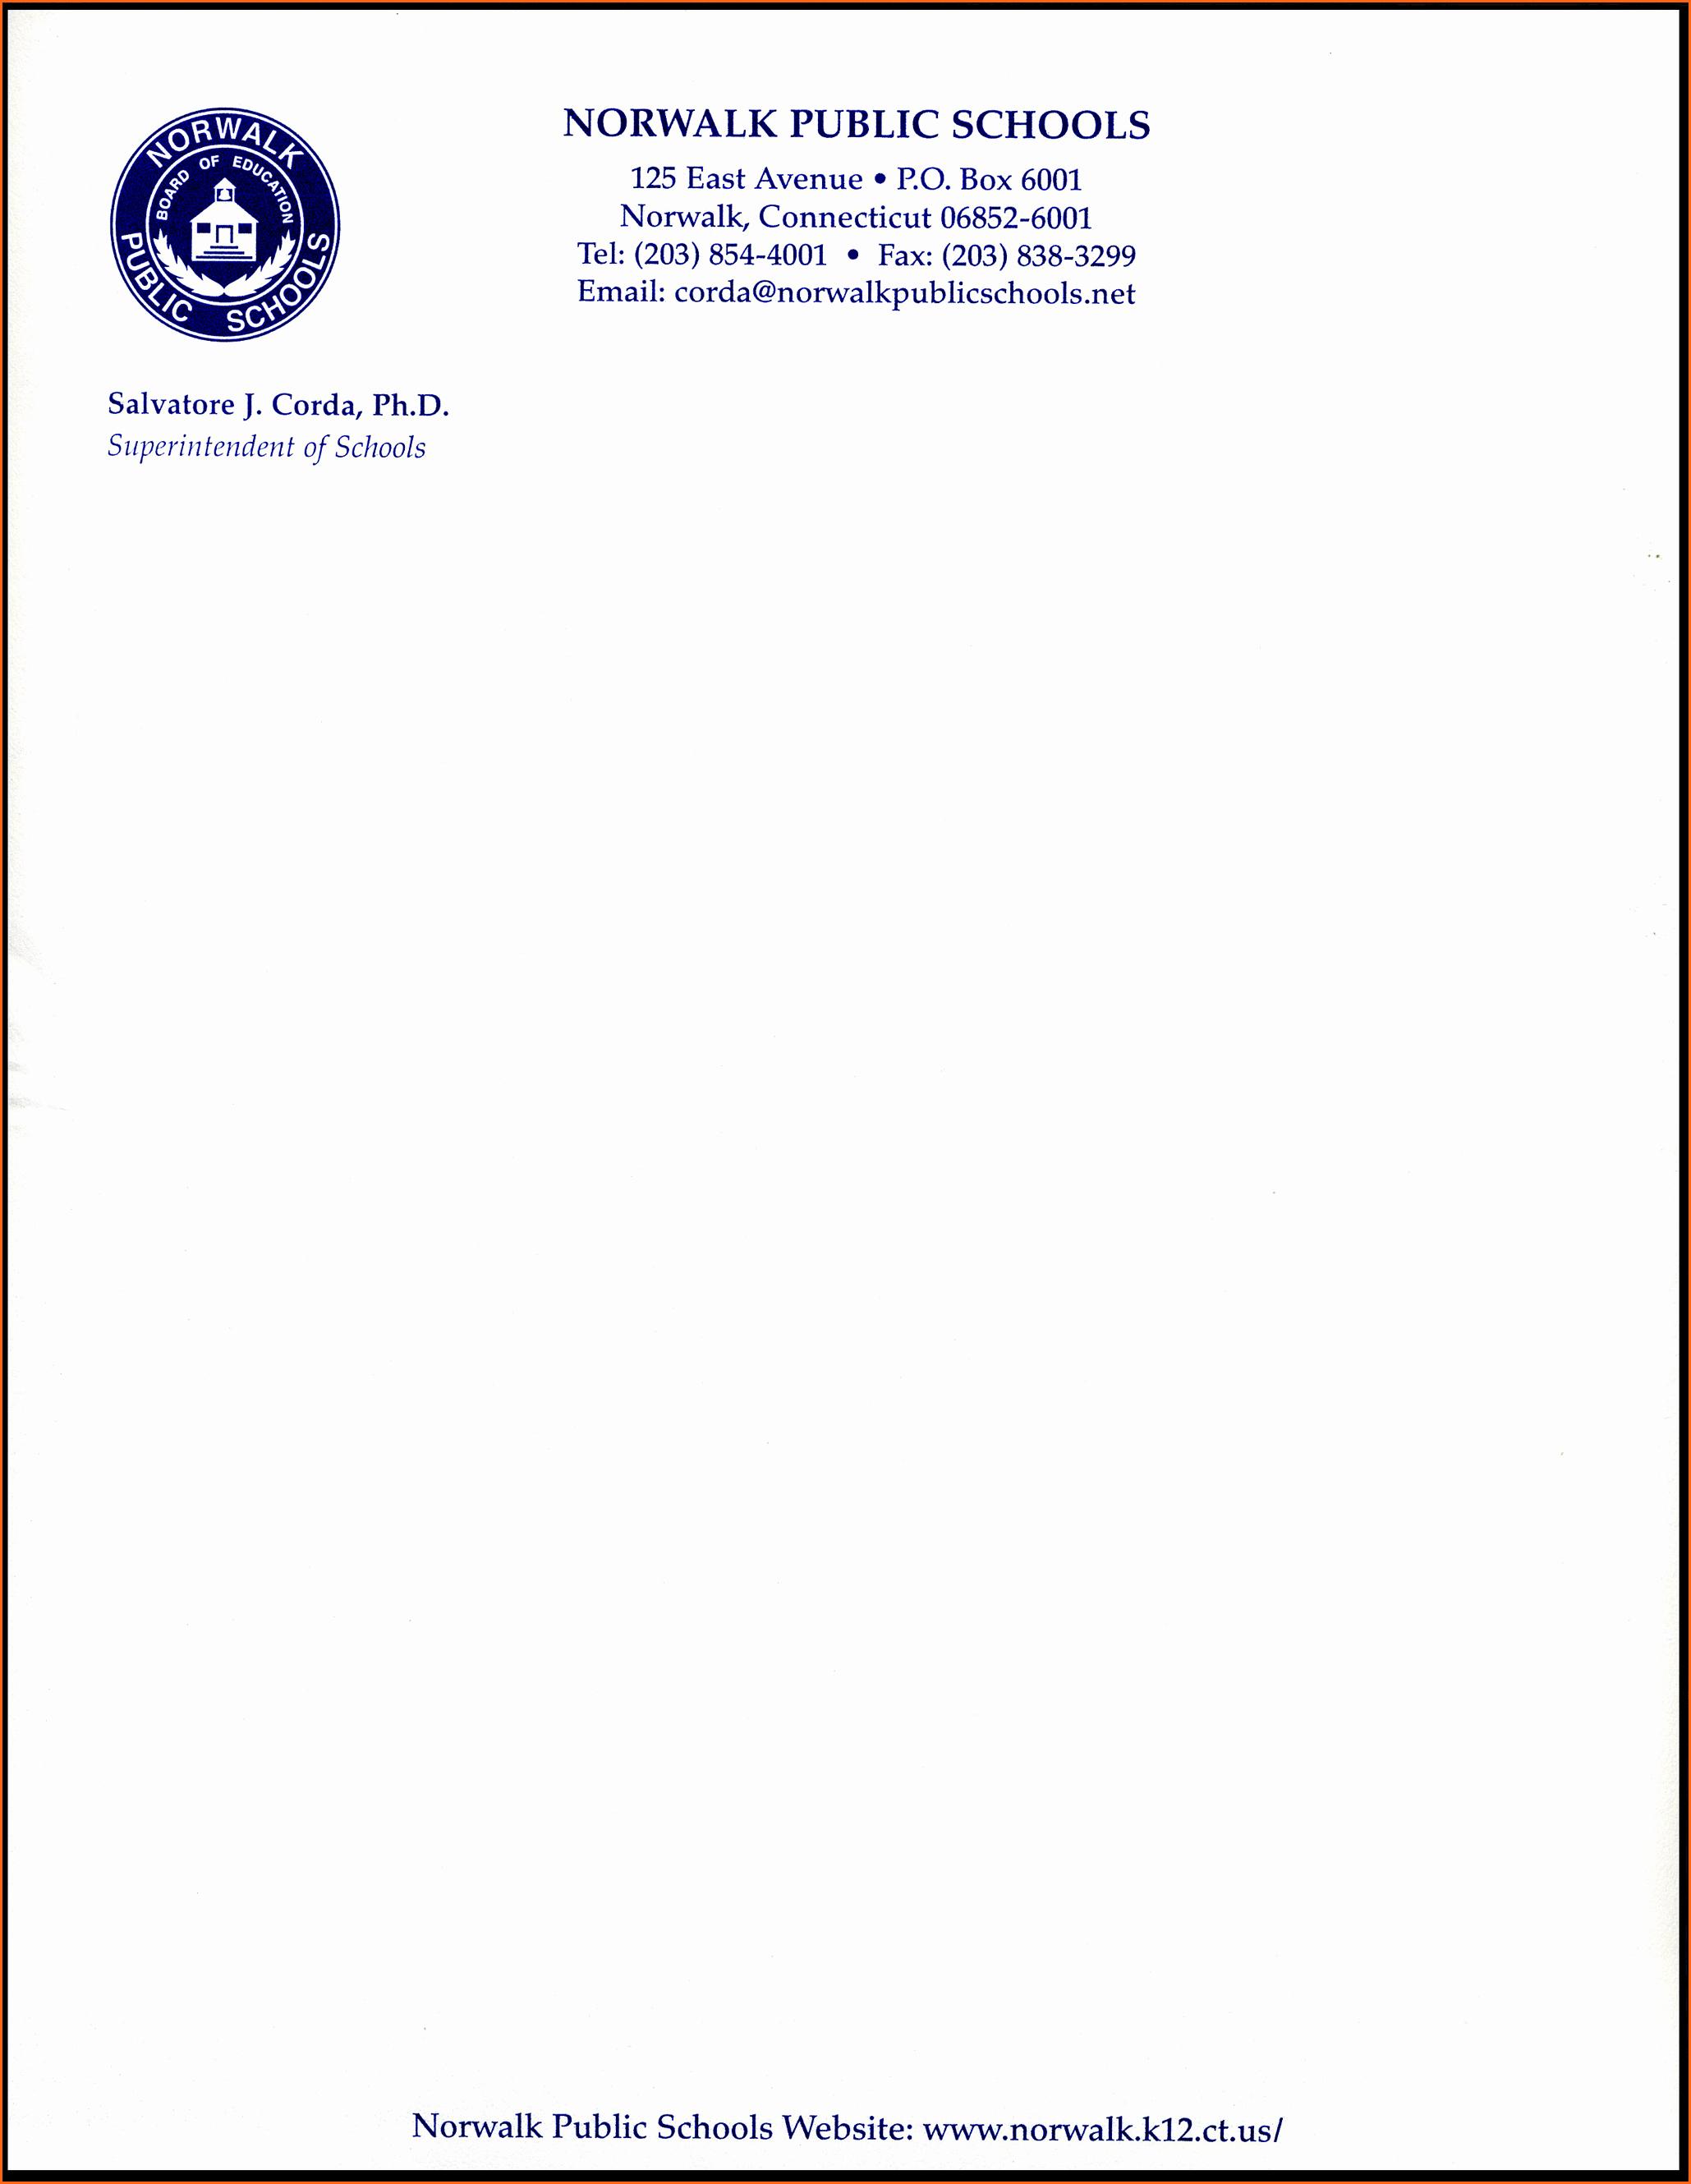 Examples Of Letterheads for Business Lovely Business Letterhead format Example Mughals